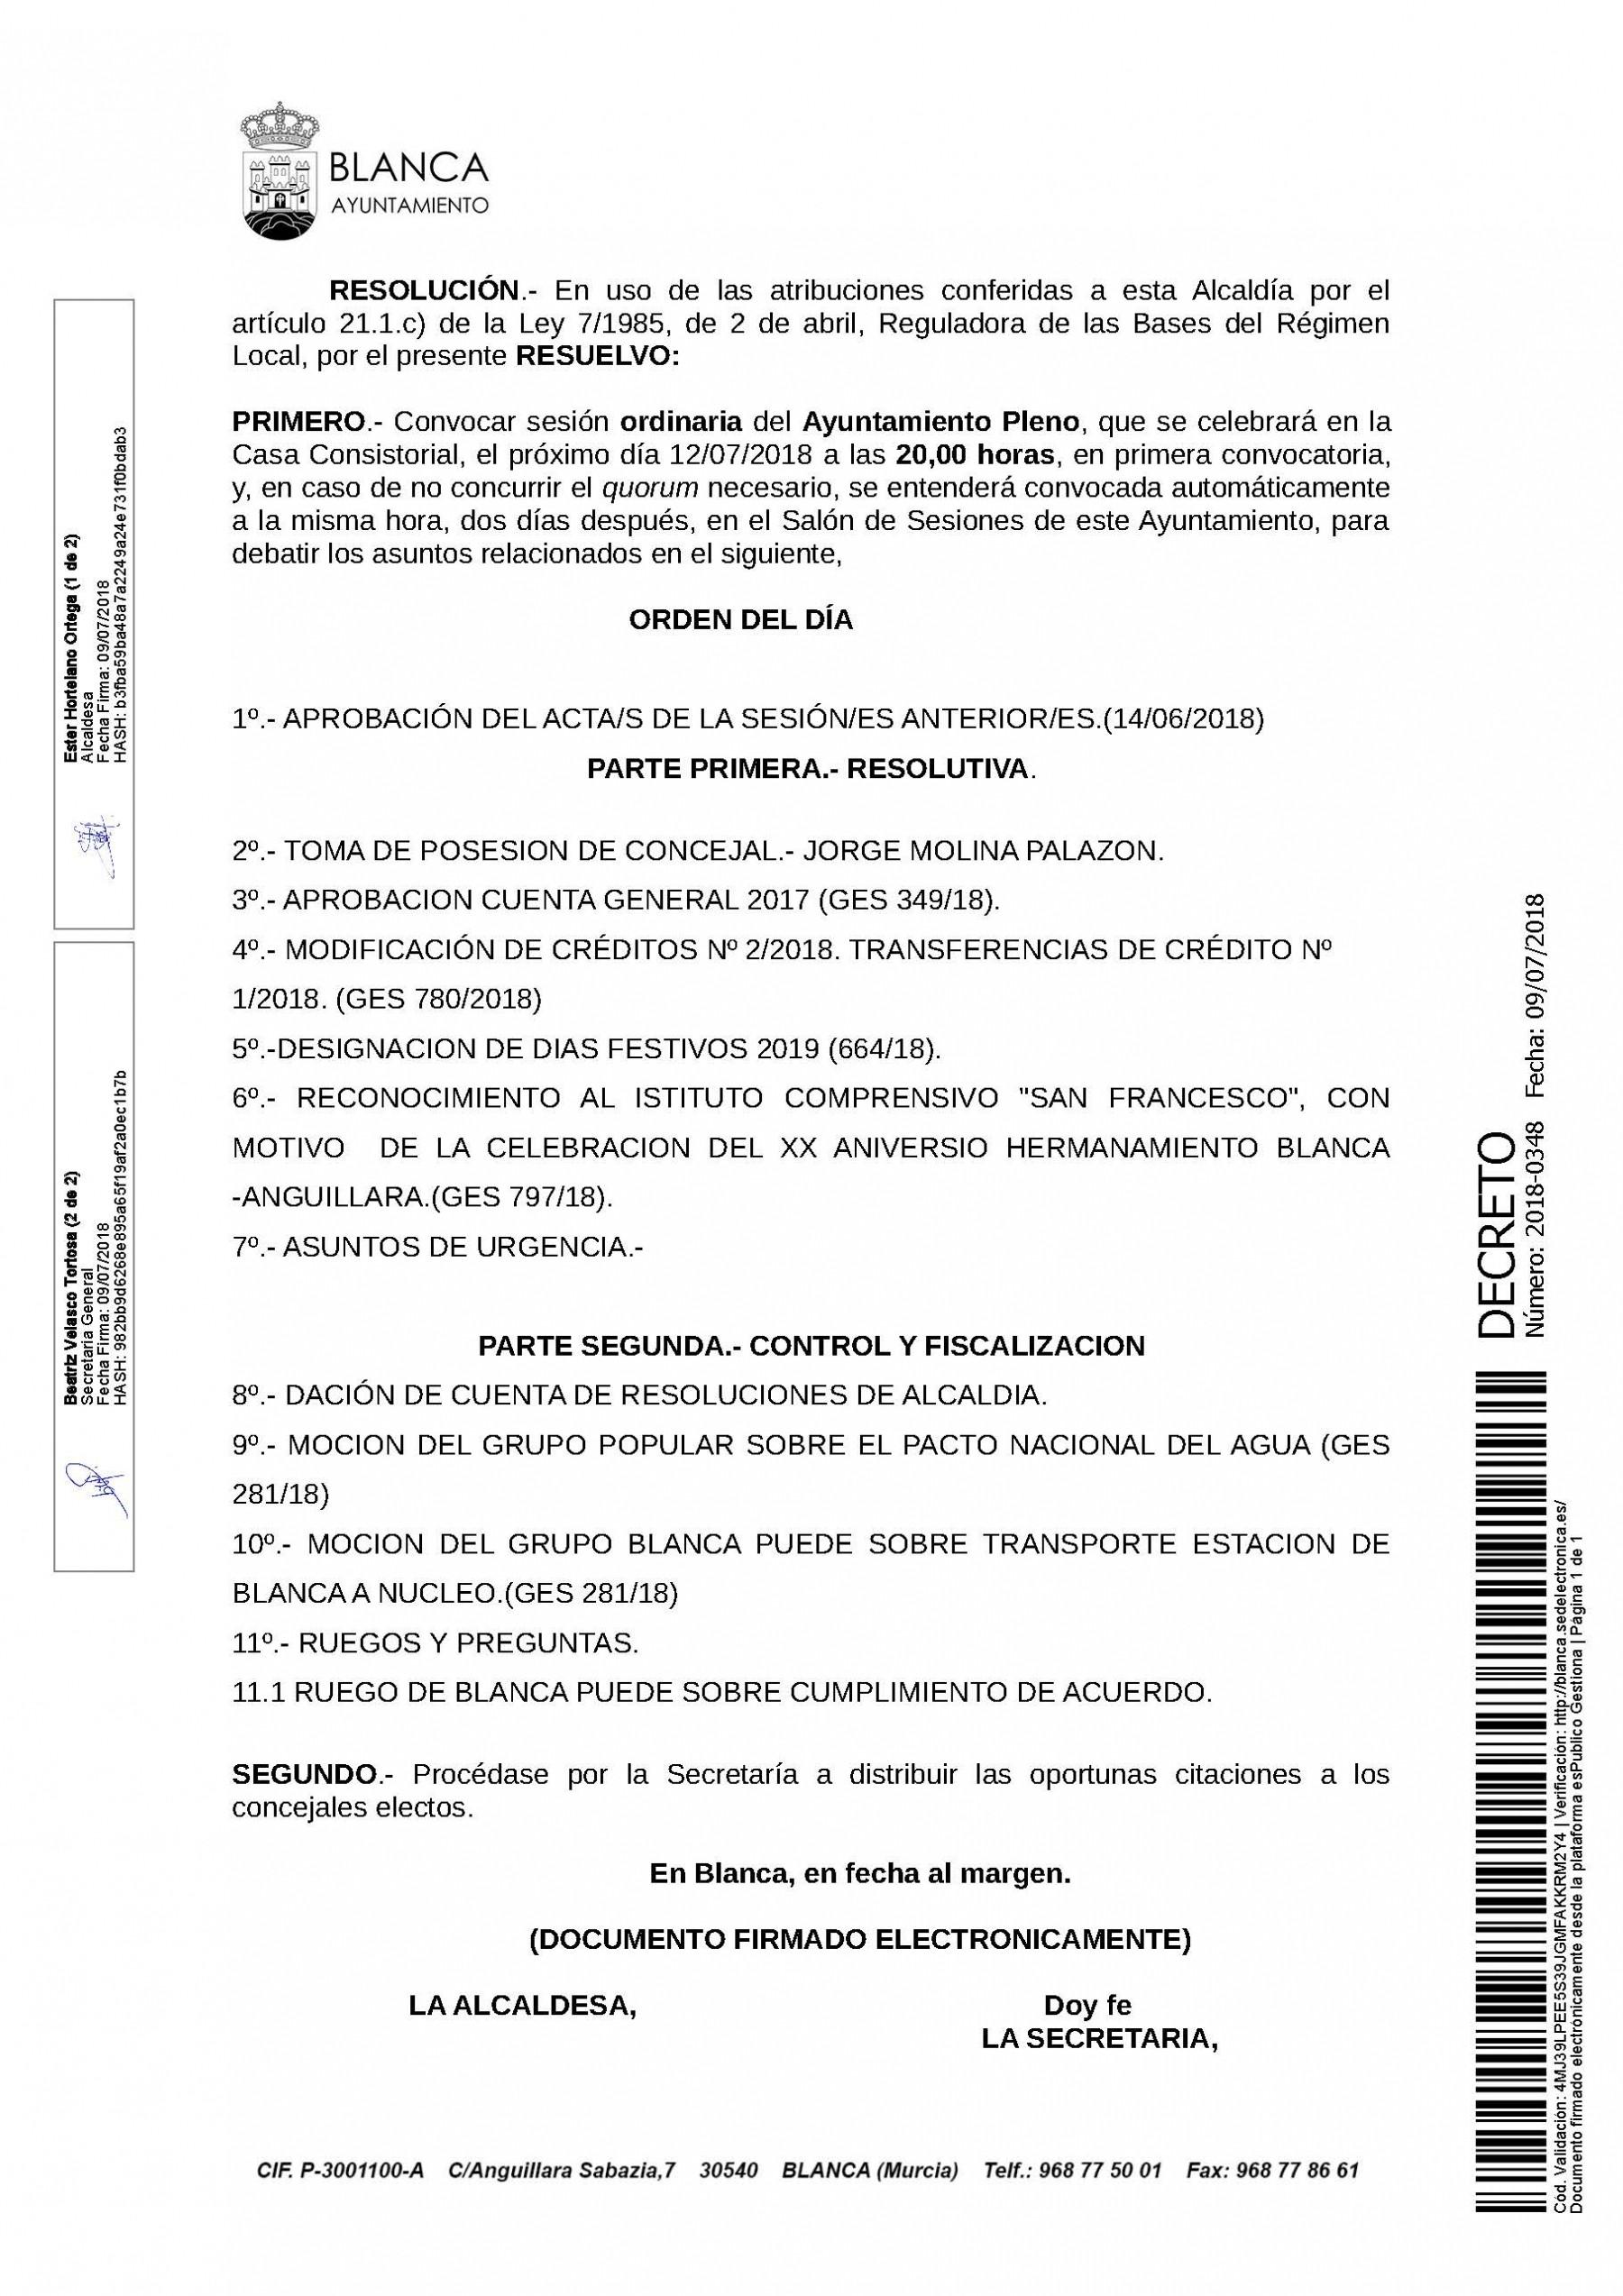 Image de Institucional Archivos Web Municipal Blanca Murcia Ayuntamiento – Festivos Murcia 2016